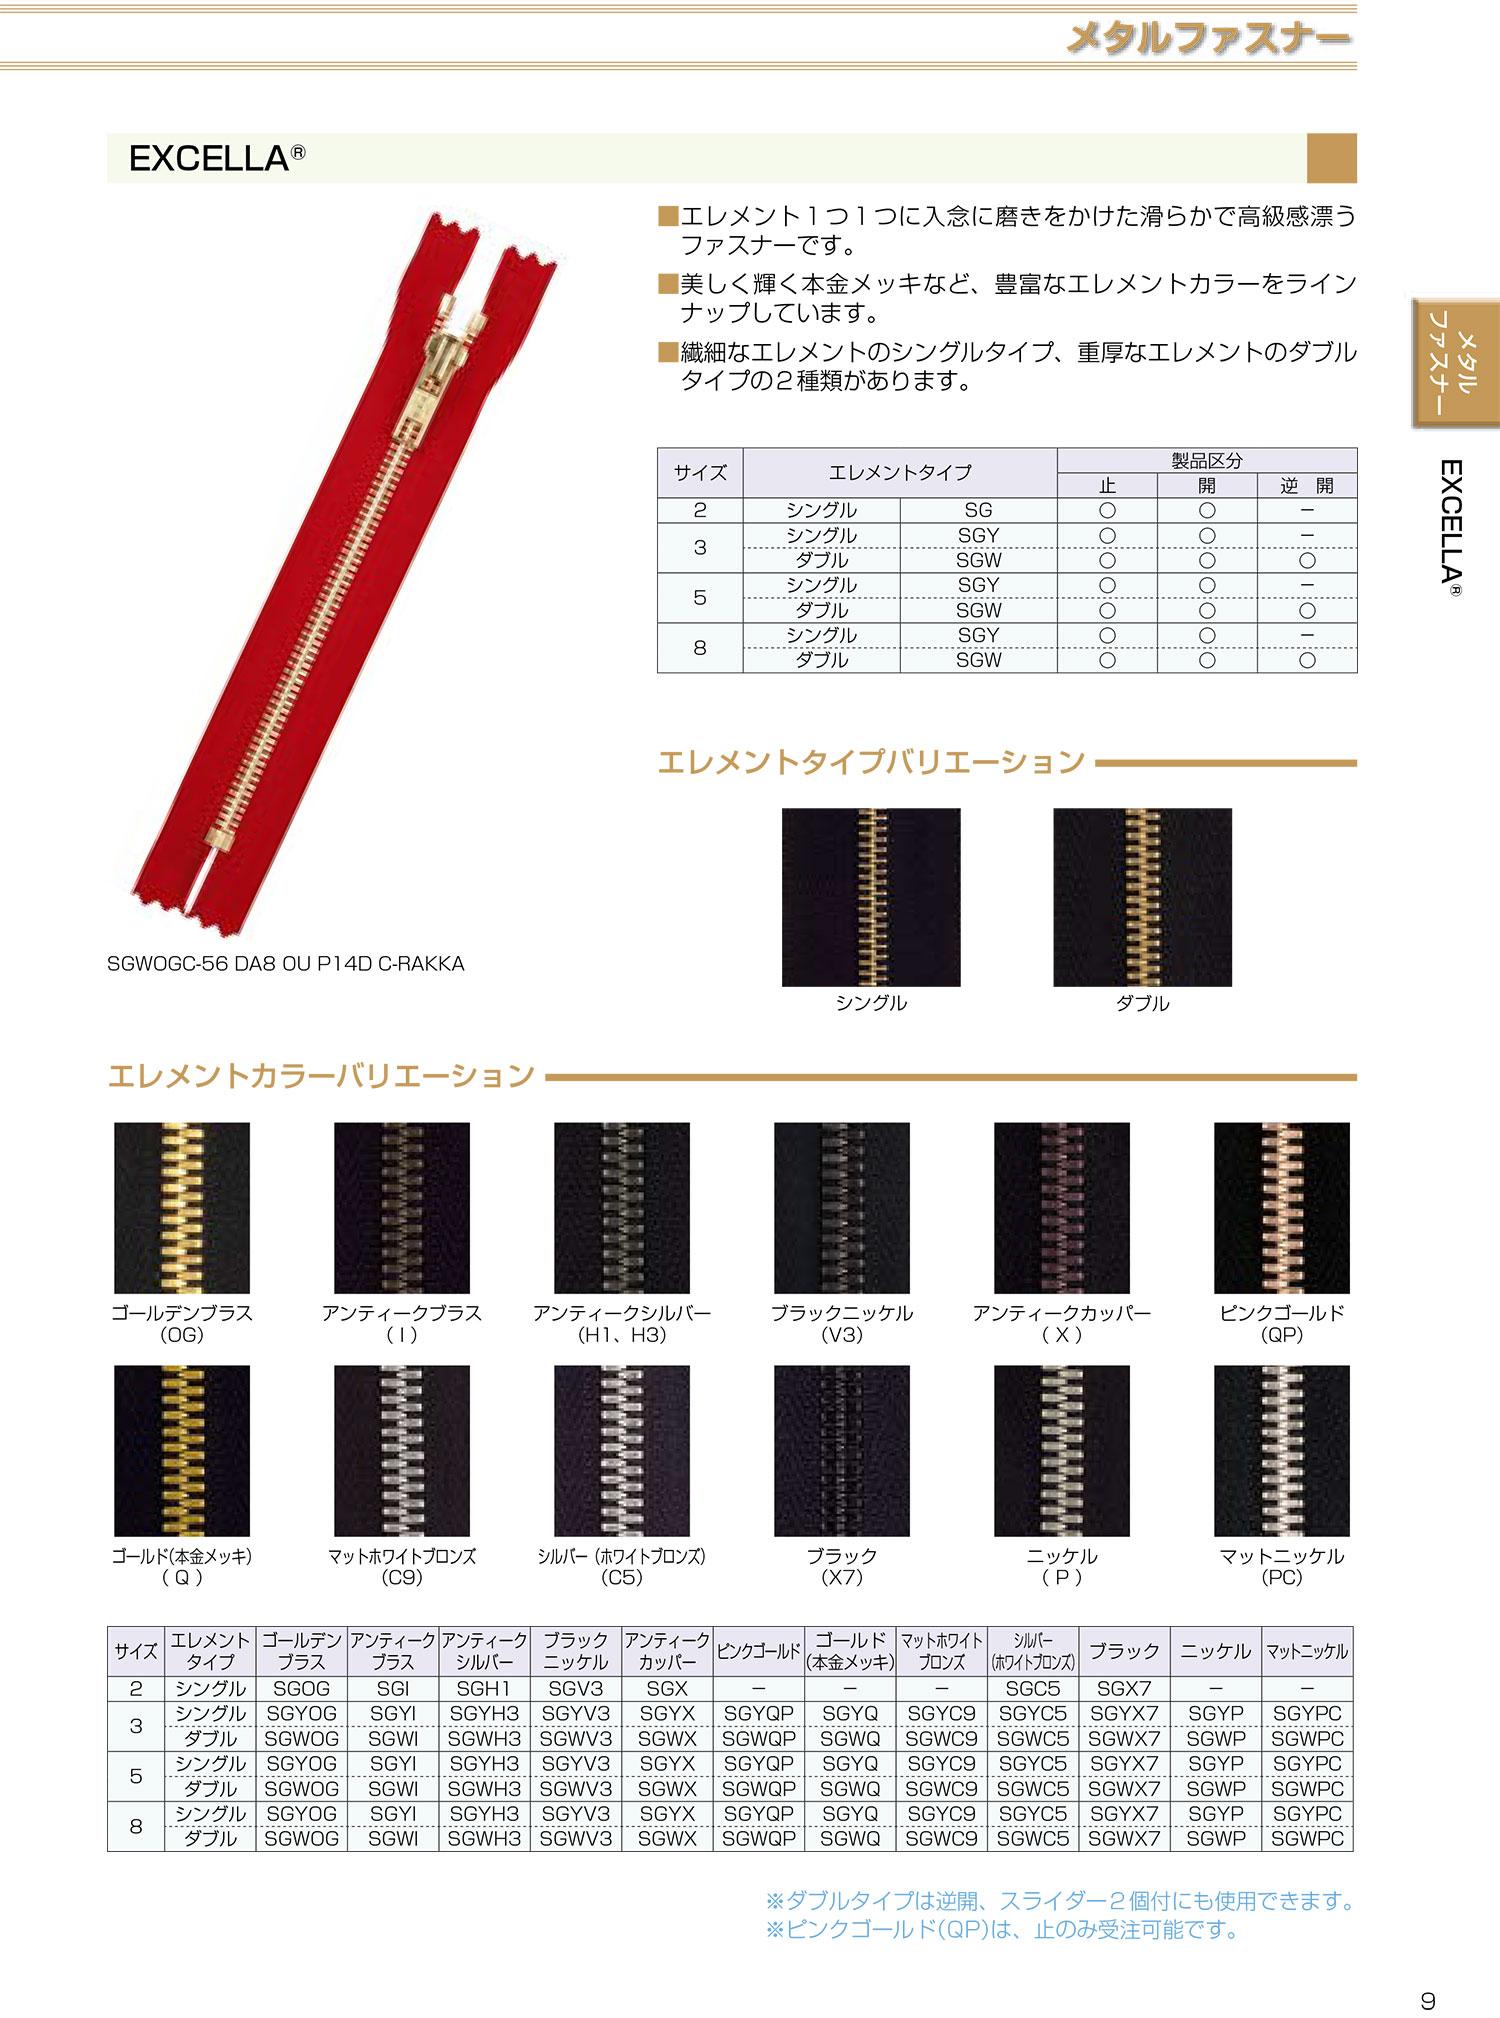 5SGWOGMR エクセラ 5サイズ ゴールデンブラス 逆開 ダブル[ファスナー] YKK/オークラ商事 - ApparelX アパレル資材卸通販